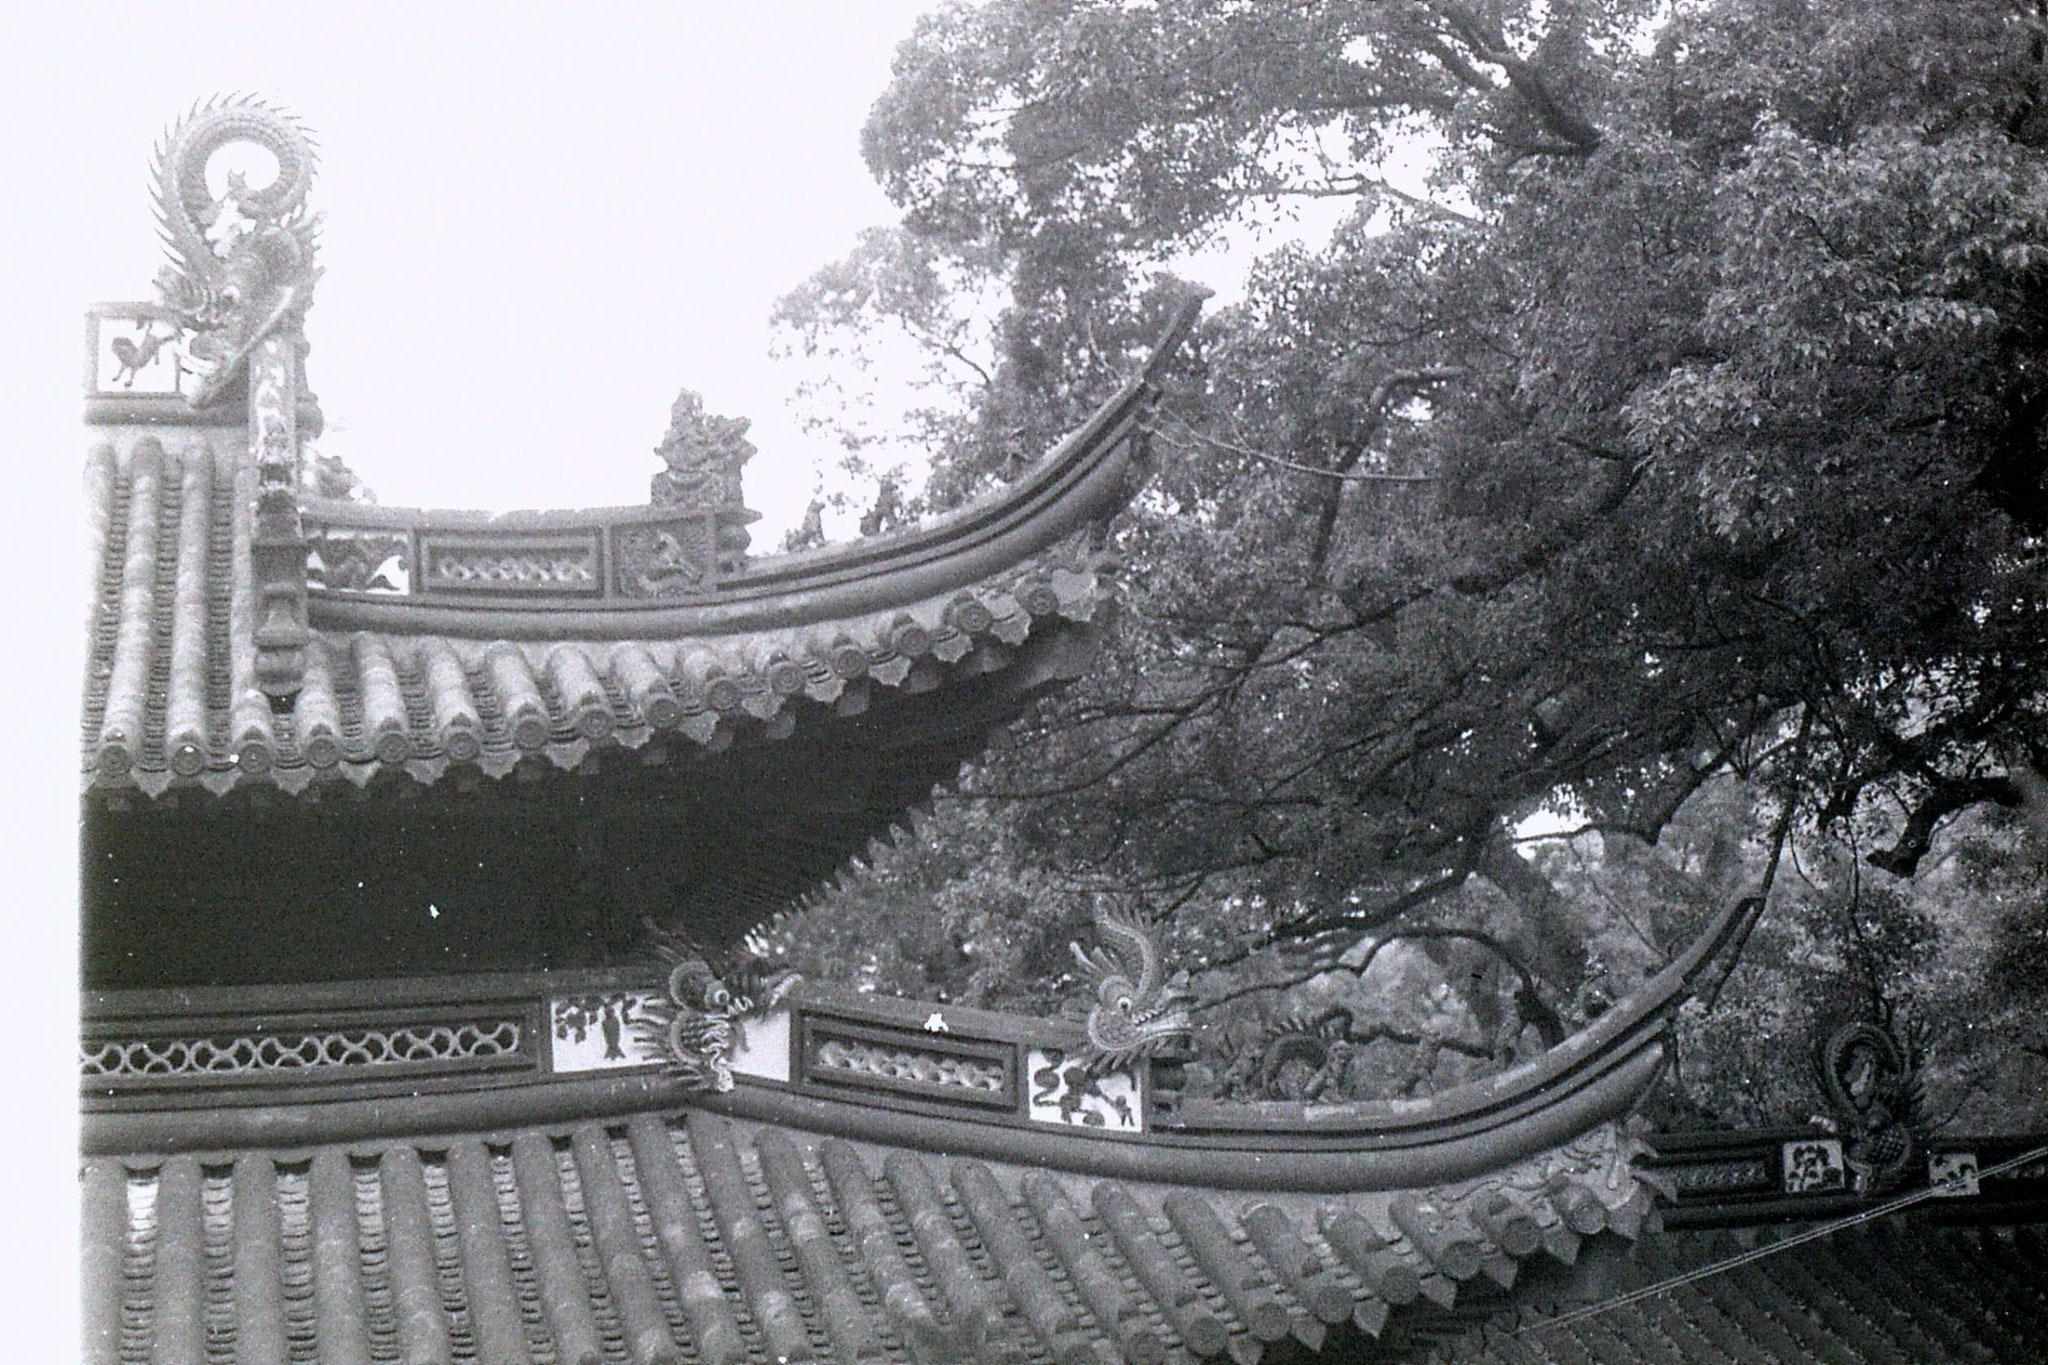 24/7/1989: 7: Putuo Huiji Si